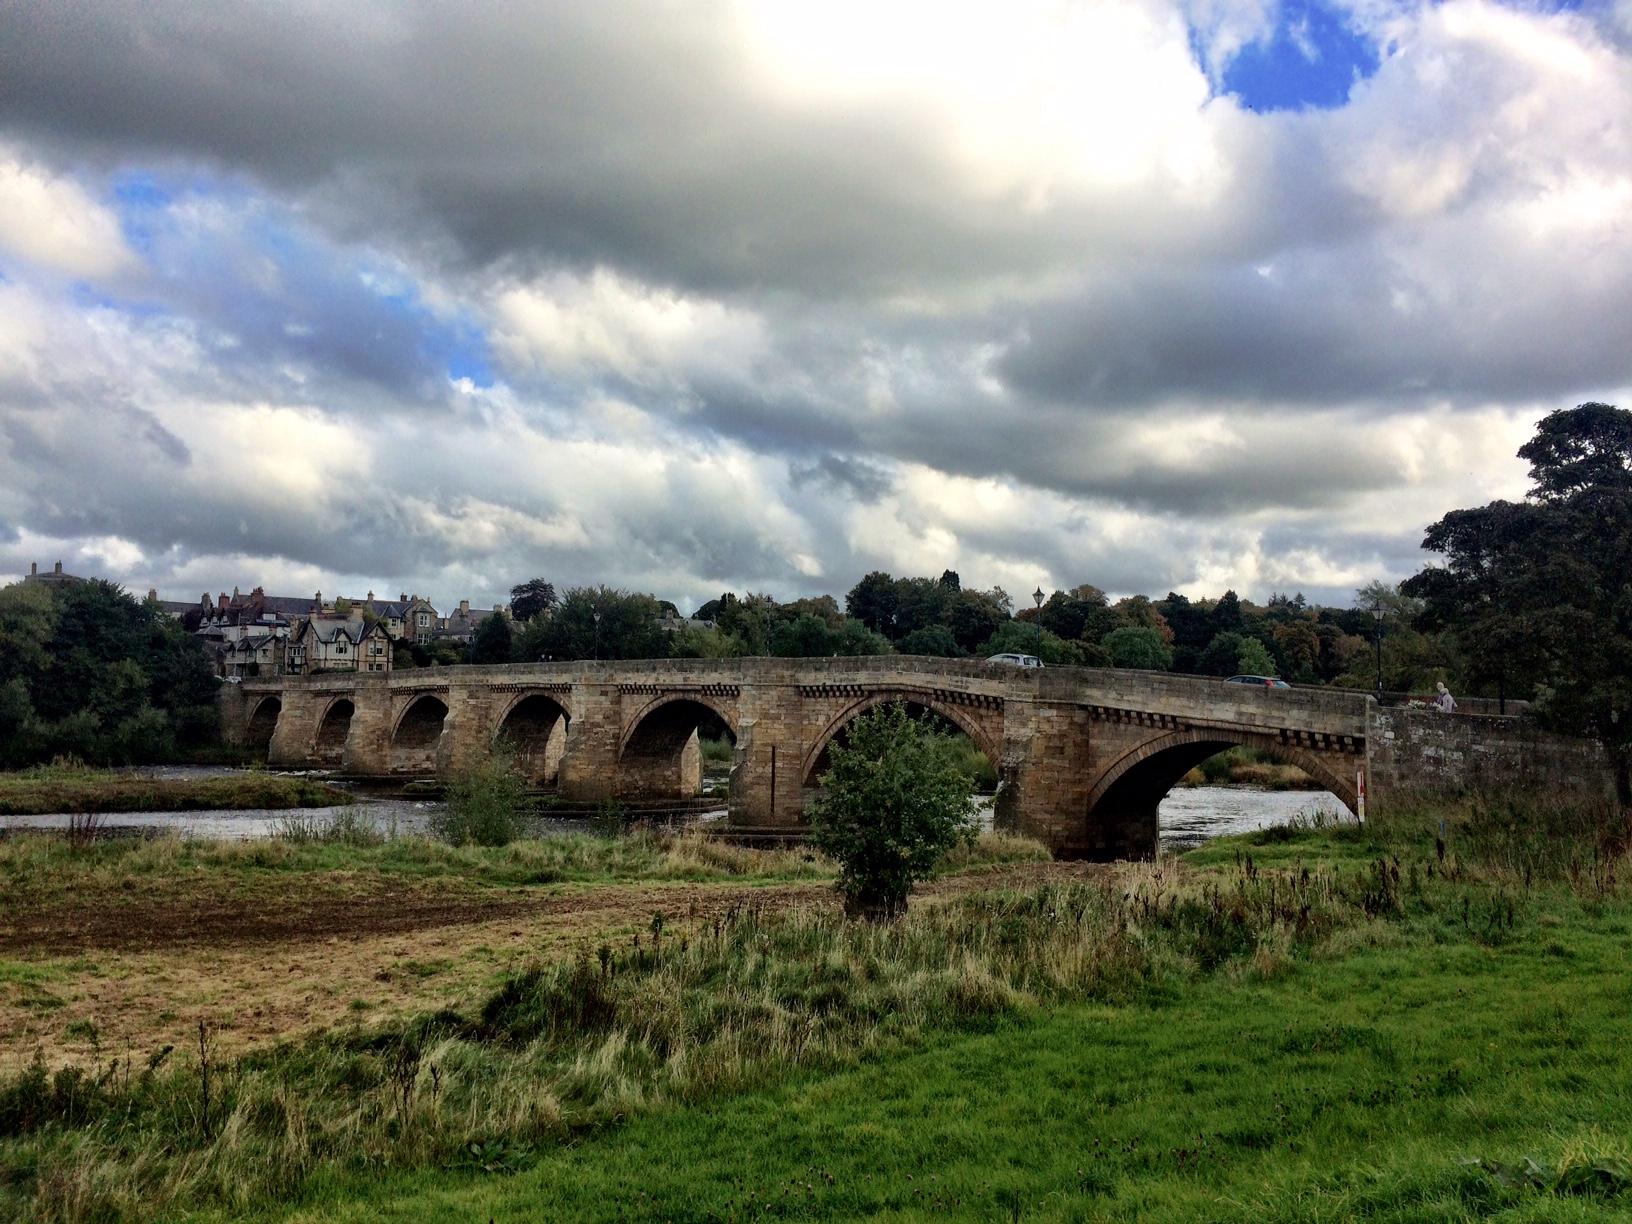 Hadrian's Wall Day 6 – Wallhouses to Newburn